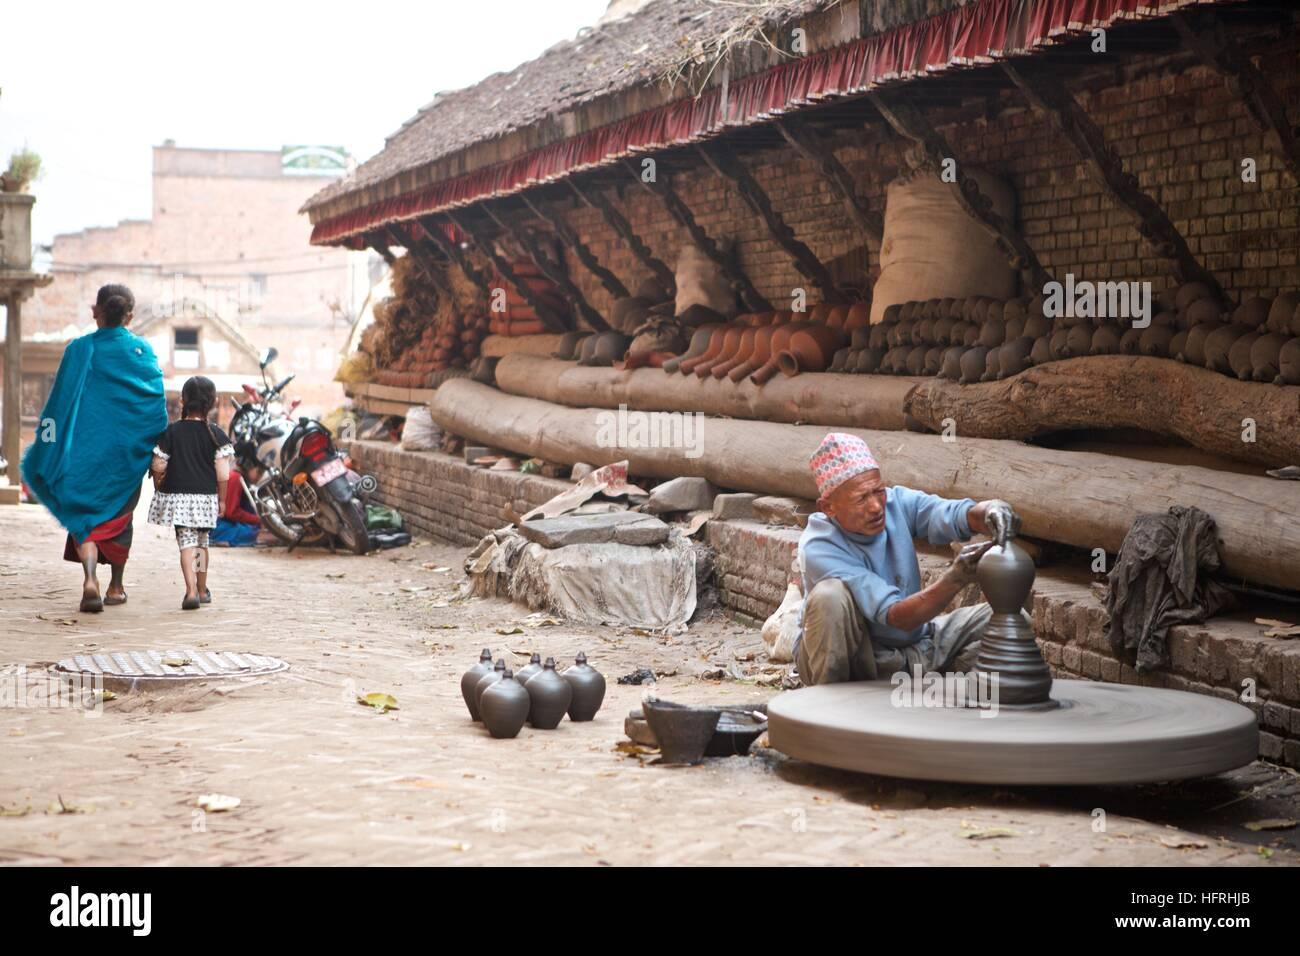 Kathmandu Bhaktapur handmade pottery vases local manufacture clay - Stock Image